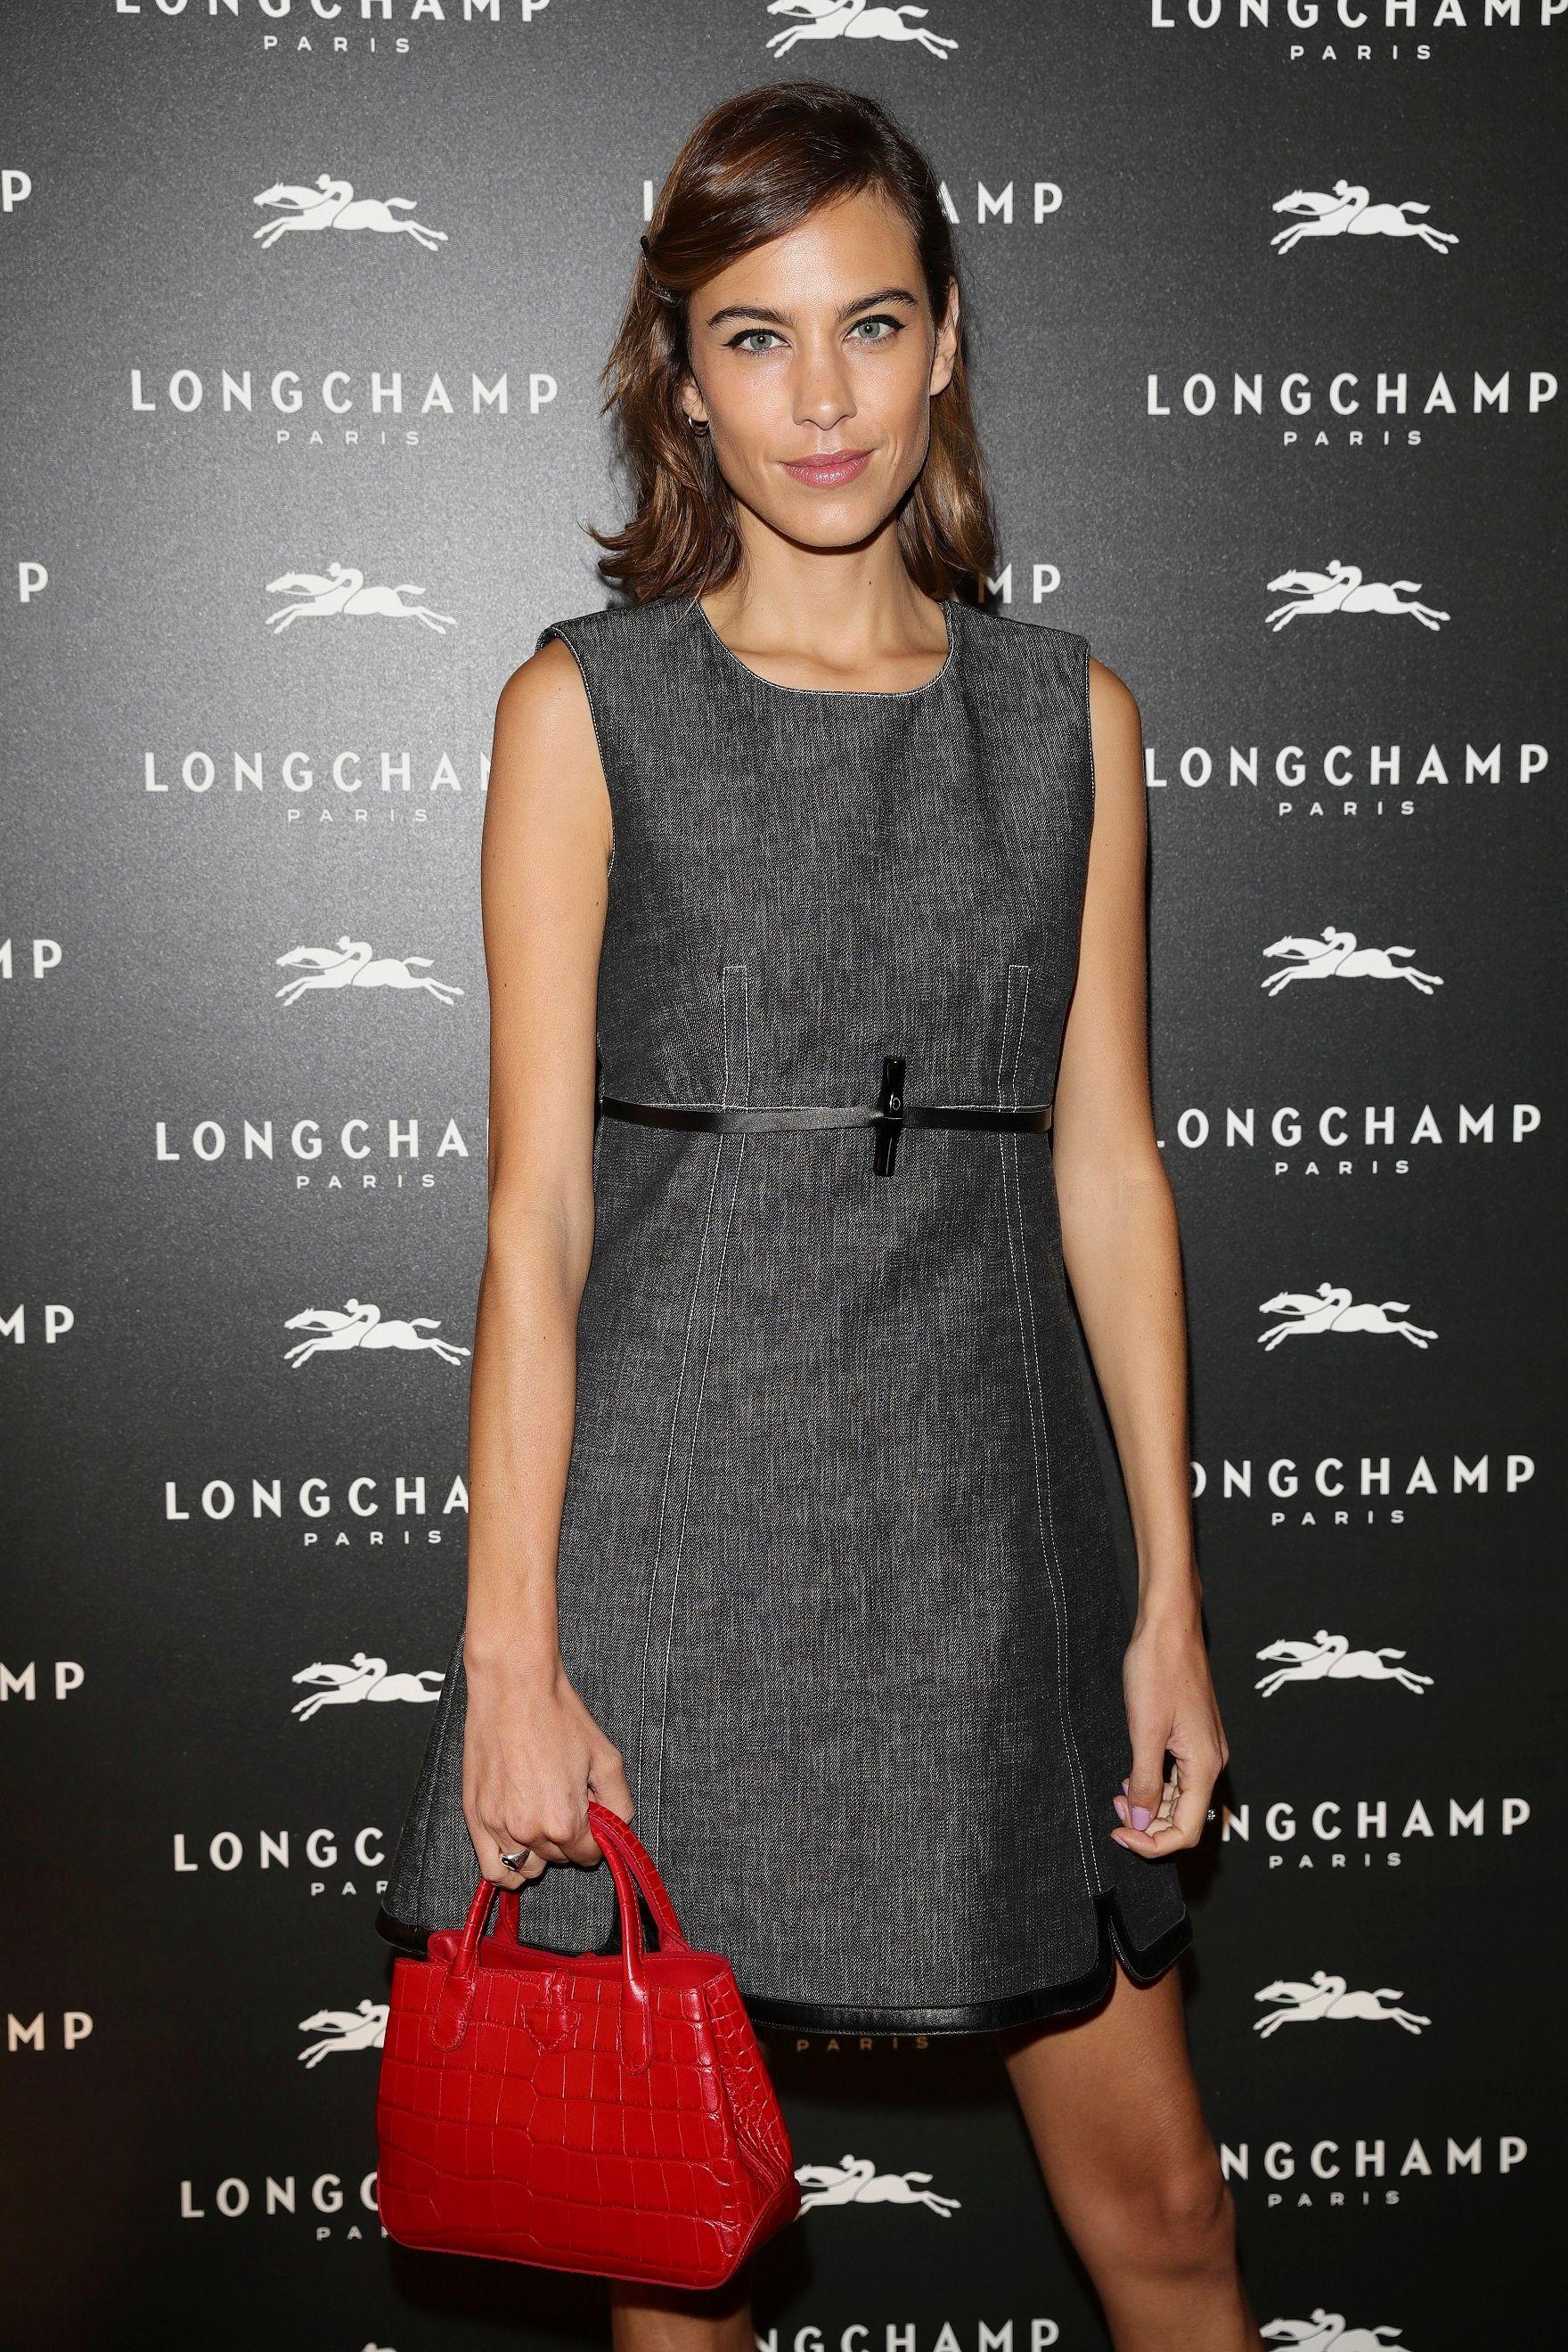 Longchamp_October4th2016_AlexaChung@getty